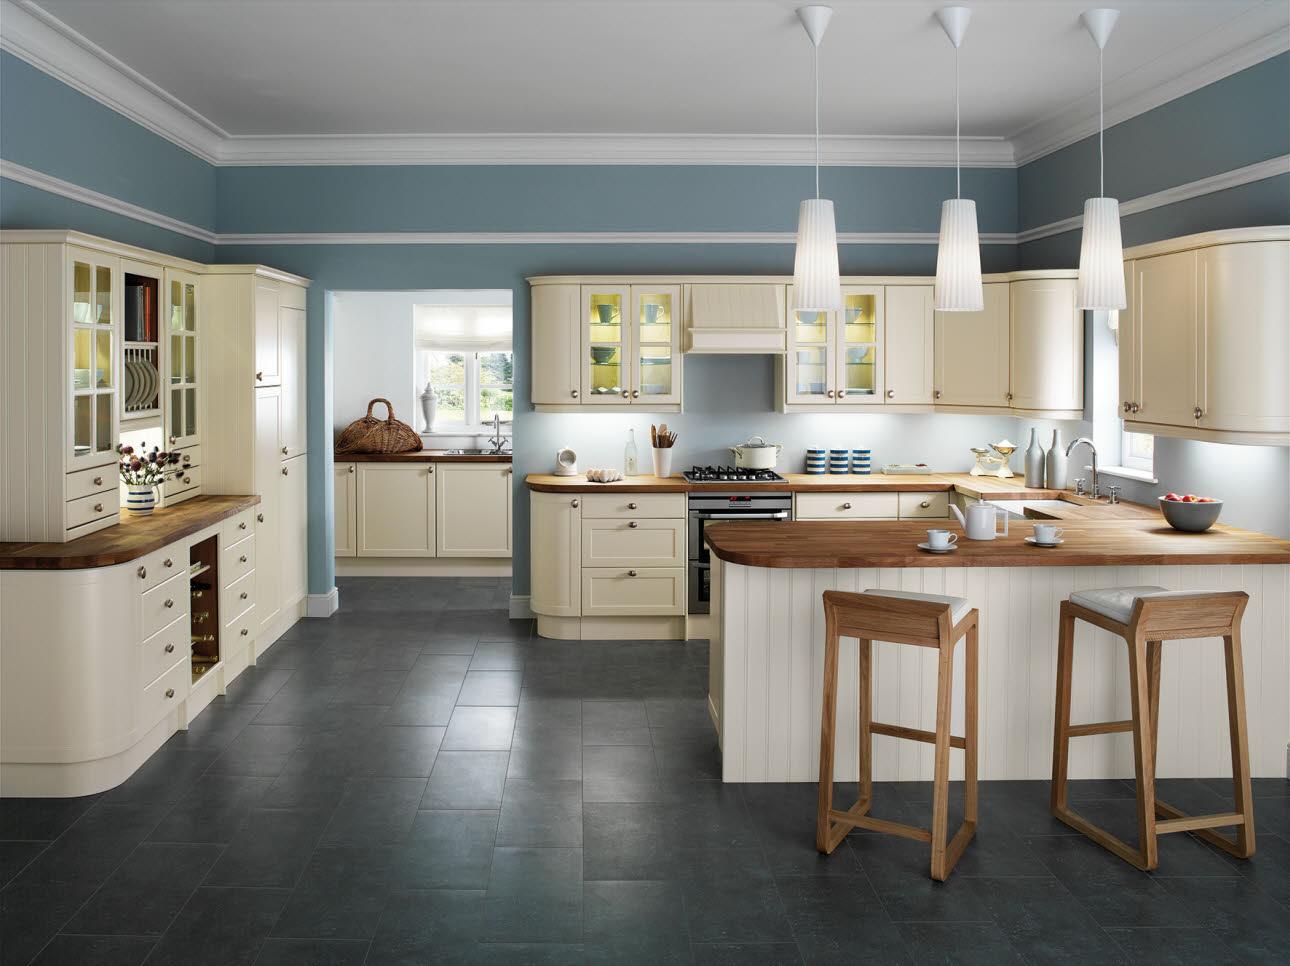 common errors in kitchen design 1 اشتباهات دکوراسیون آشپزخانه